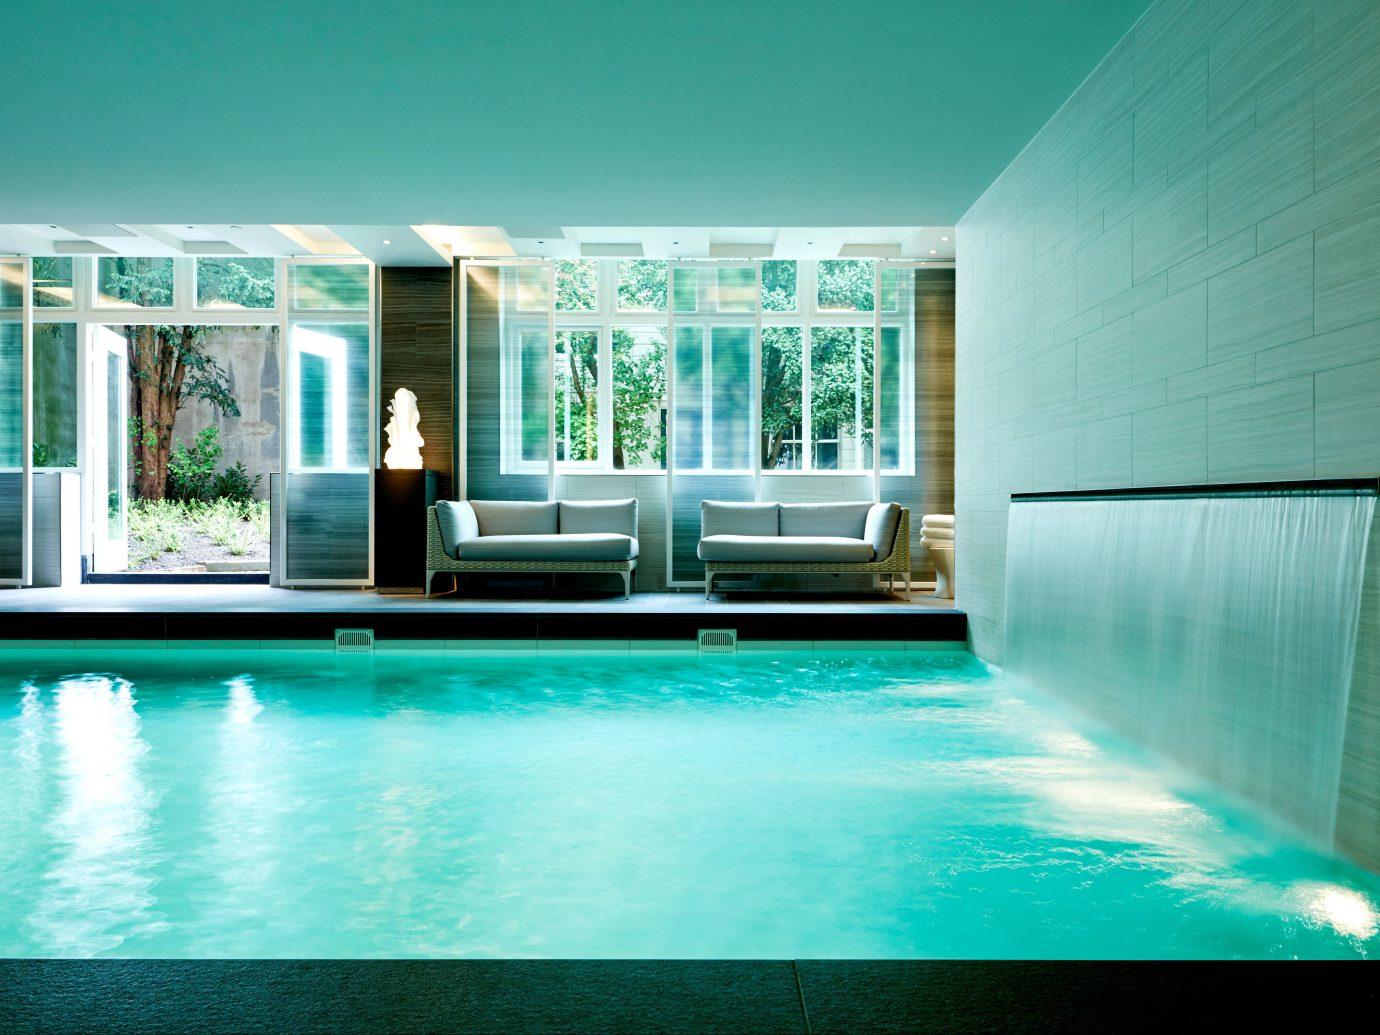 Amsterdam Boutique Hotels City Elegant Family Hotels Luxury Pool Romantic Spa The Netherlands water swimming pool property leisure building condominium floor interior design estate Resort